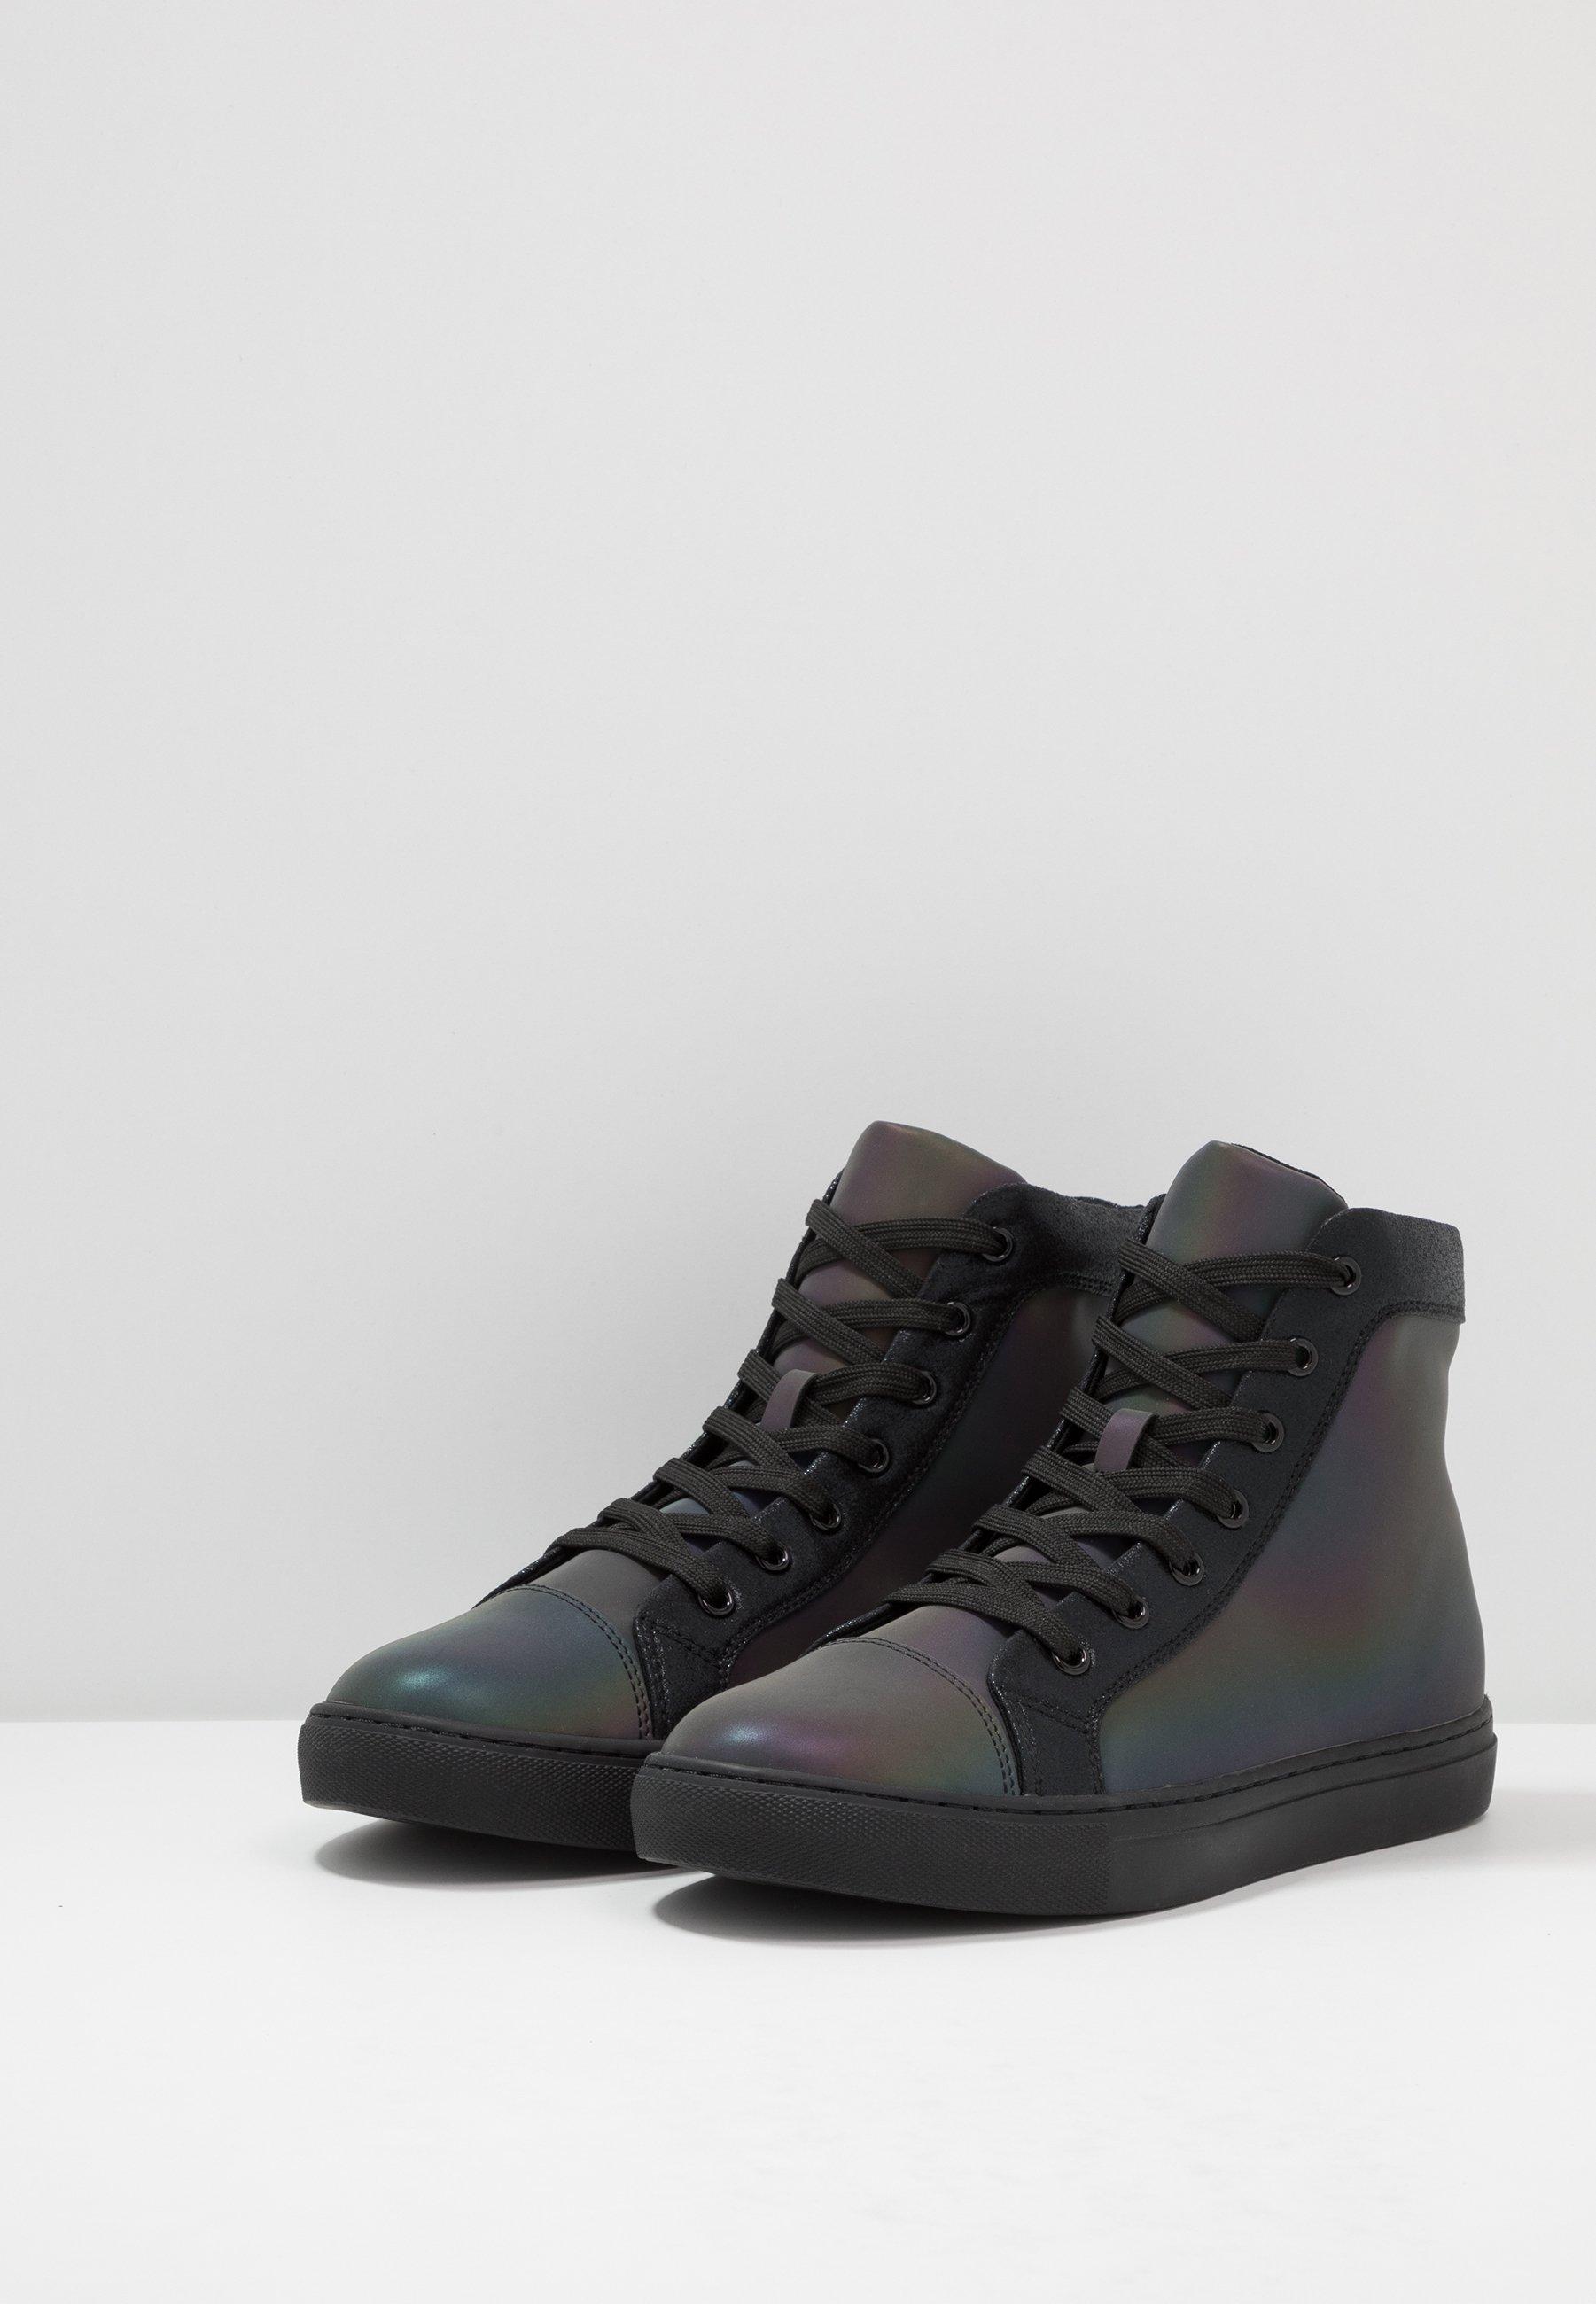 Steve Madden Coded - Höga Sneakers Iridescent